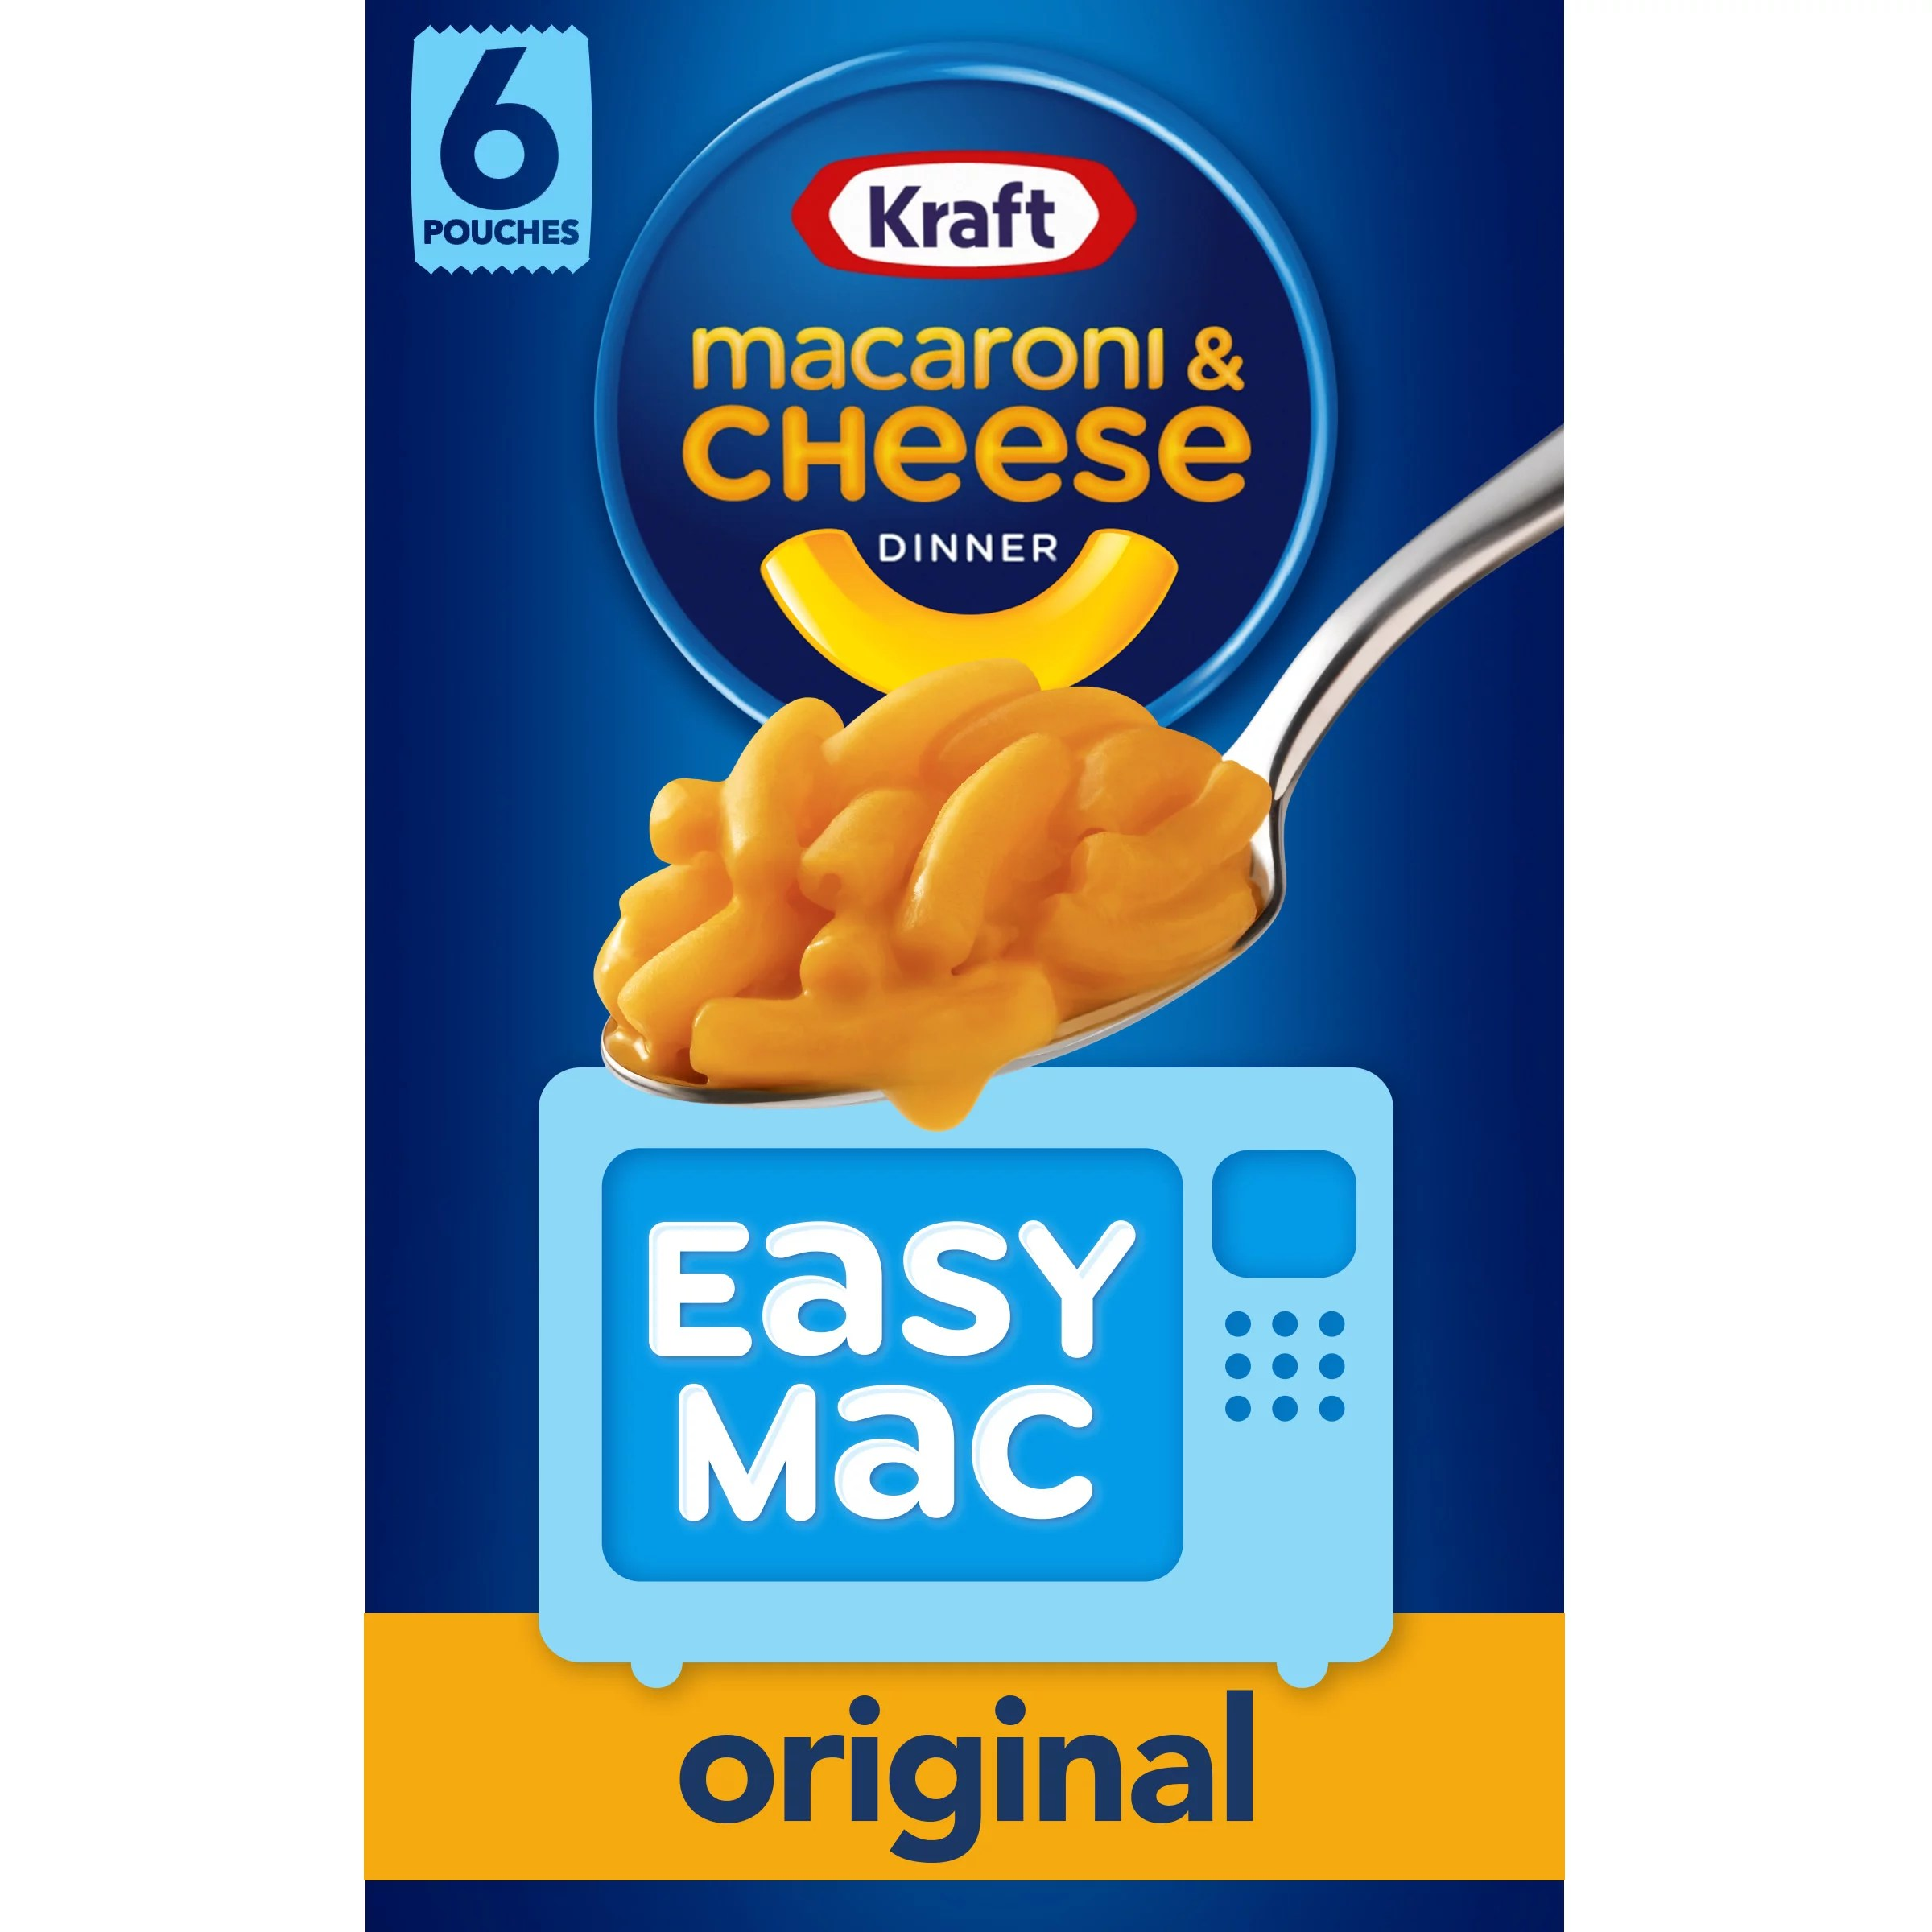 kraft easy mac original macaroni cheese microwavable dinner 6 ct packets walmart com